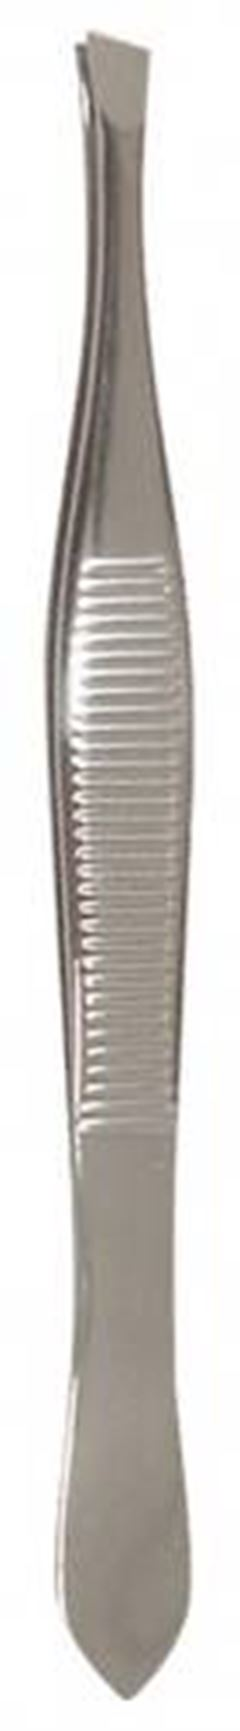 PINCA ENOX PONTA               DIAGONAL